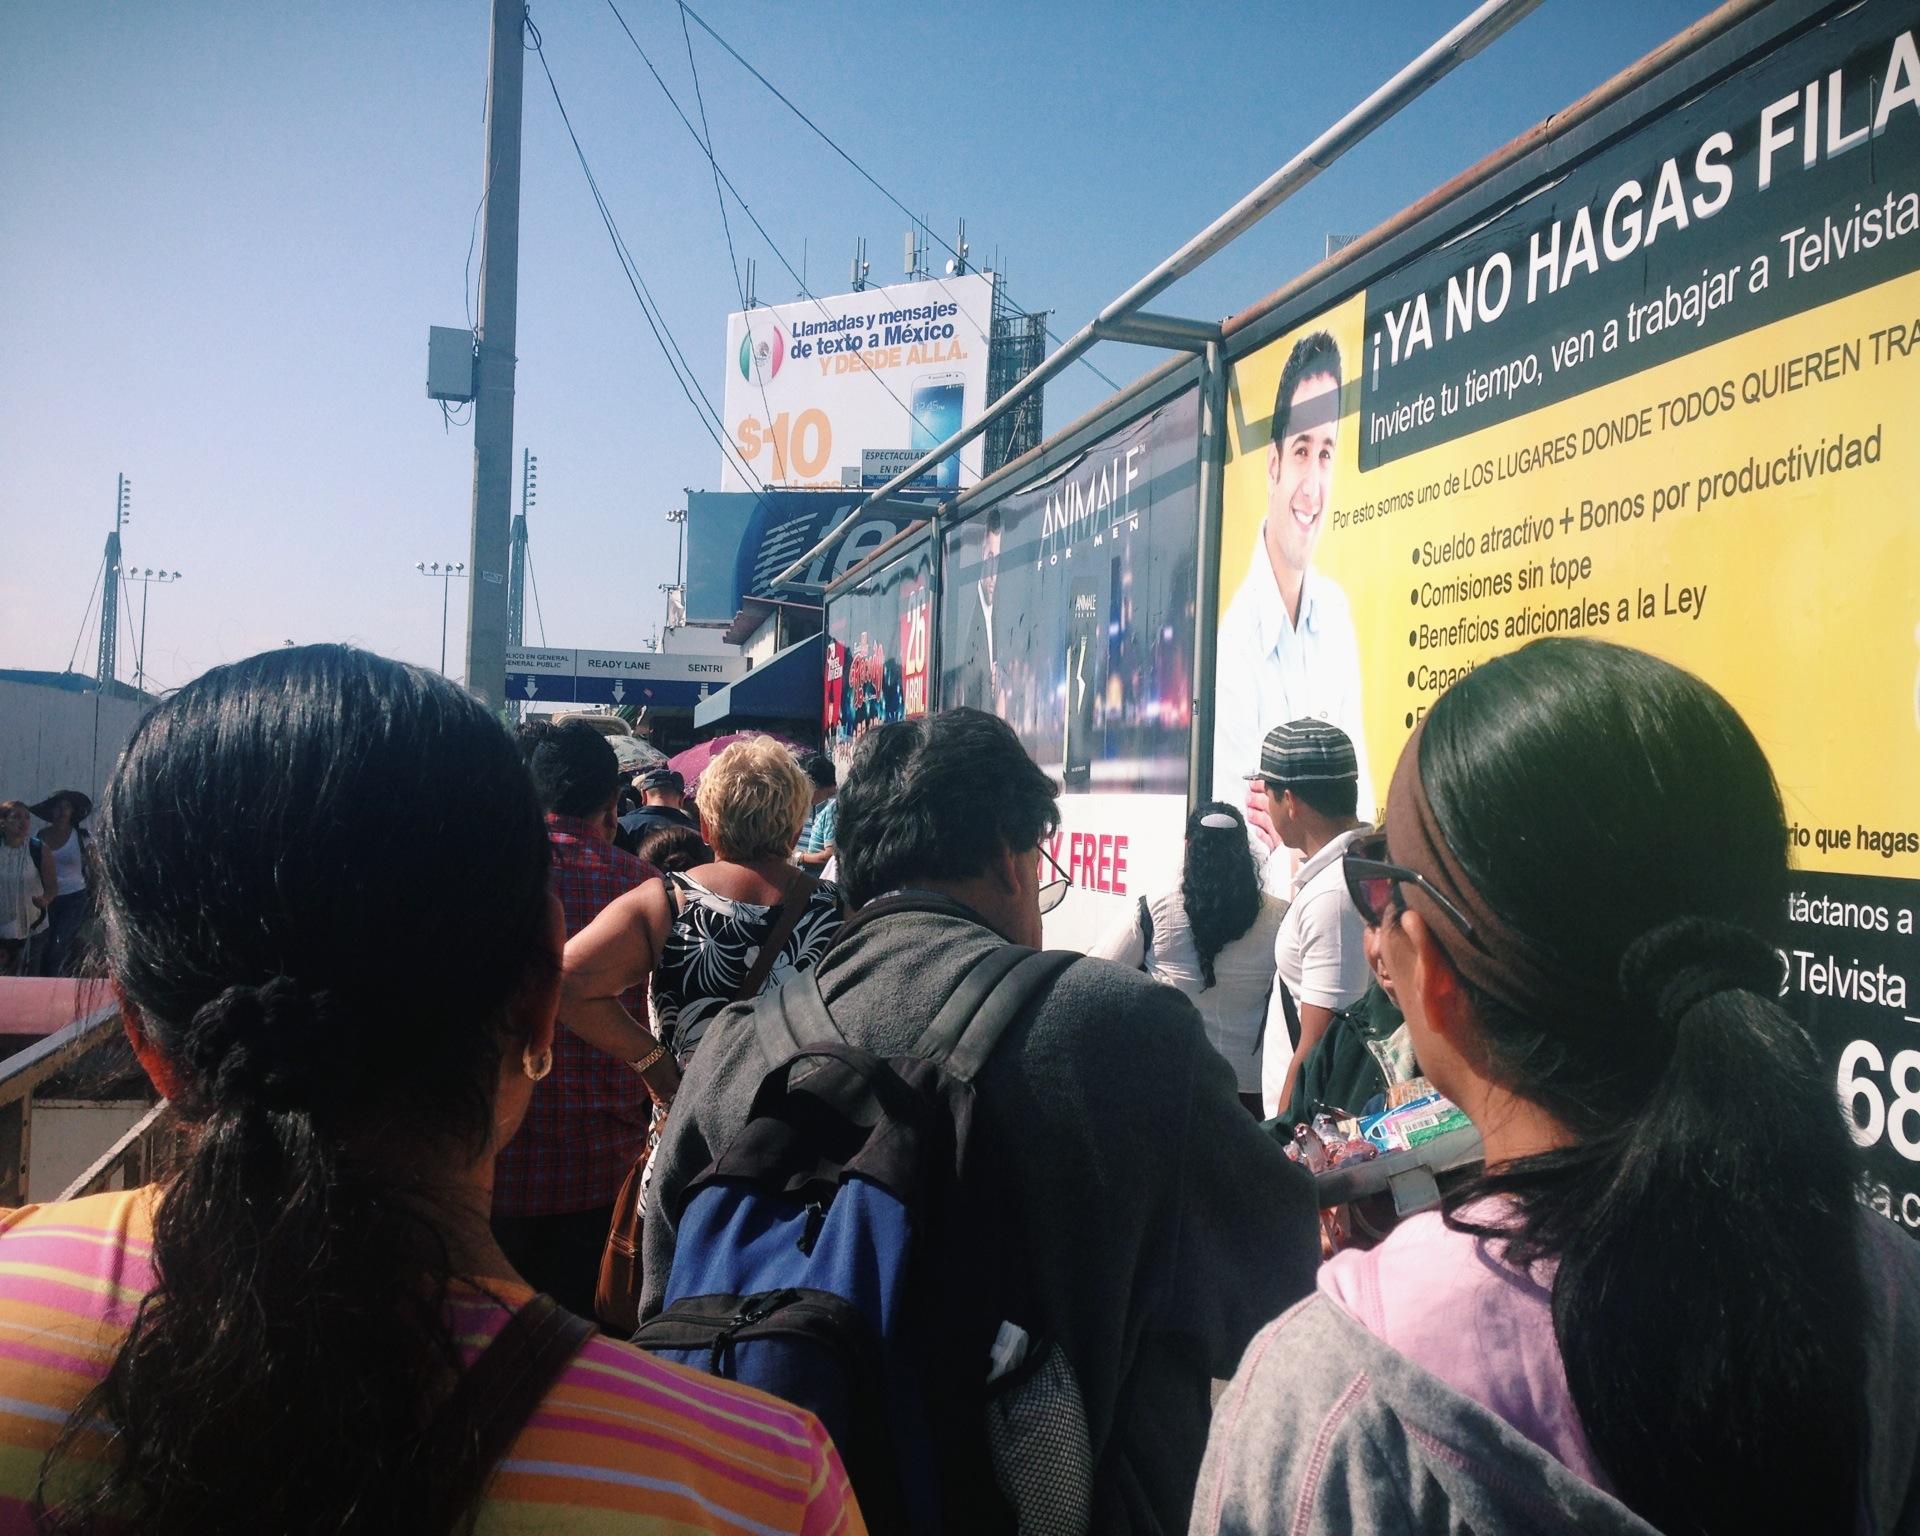 Waiting in line at the Tijuana border